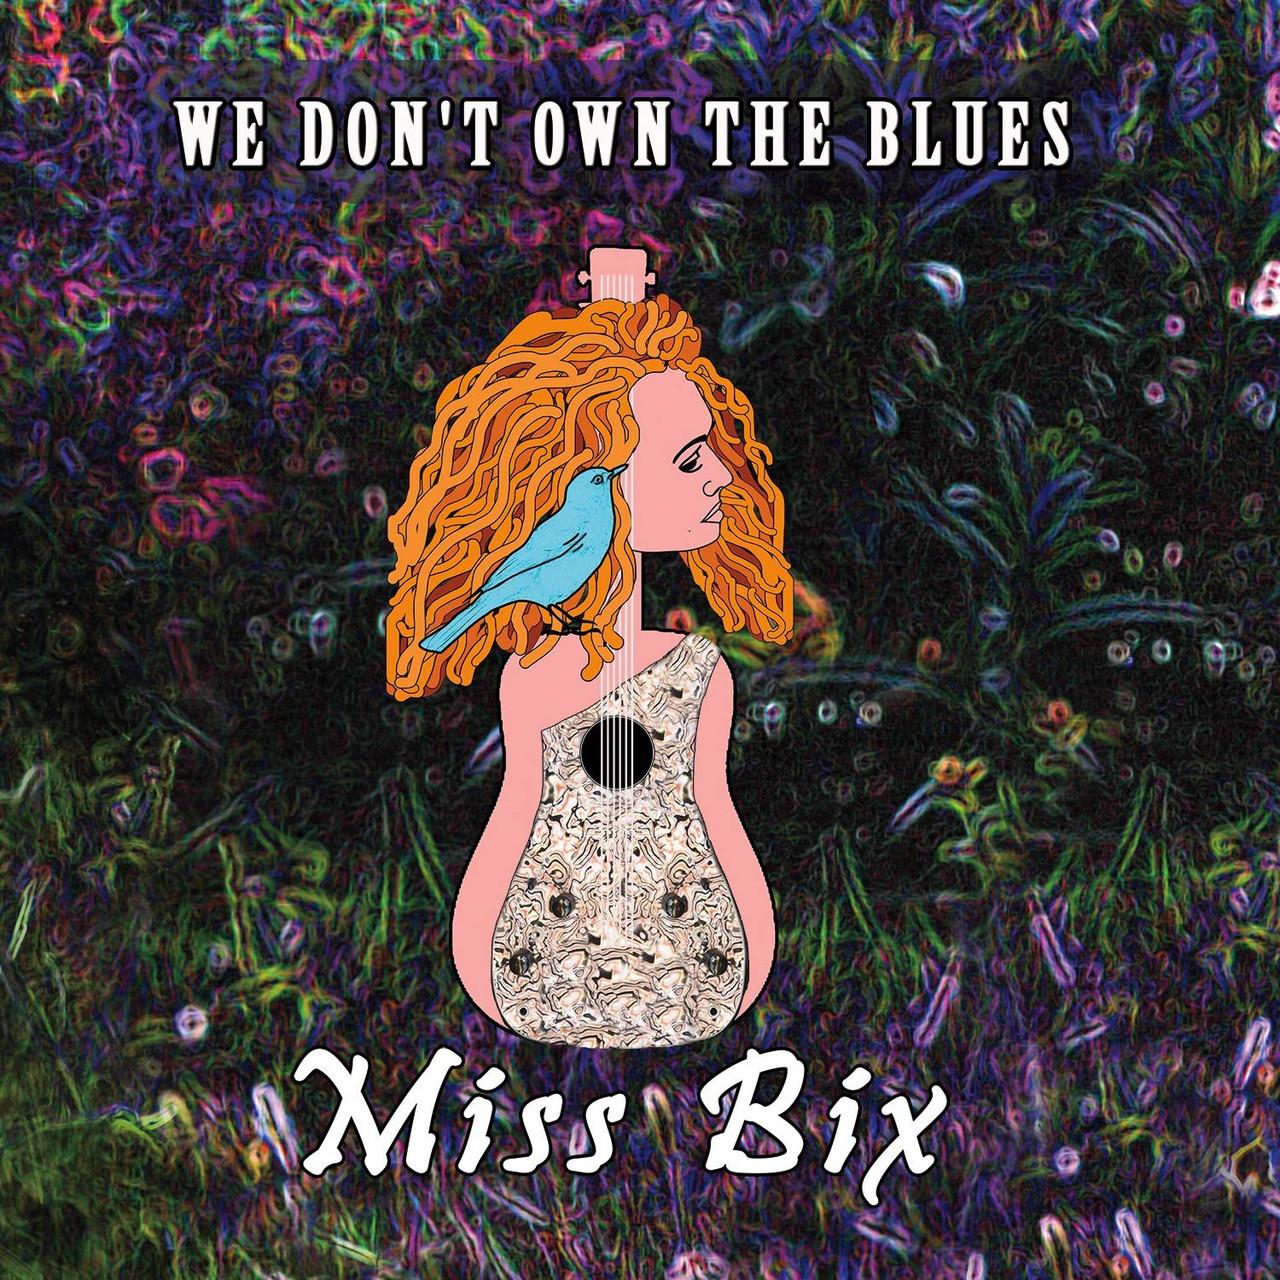 MISS BIX -  We Don't Own The Blues